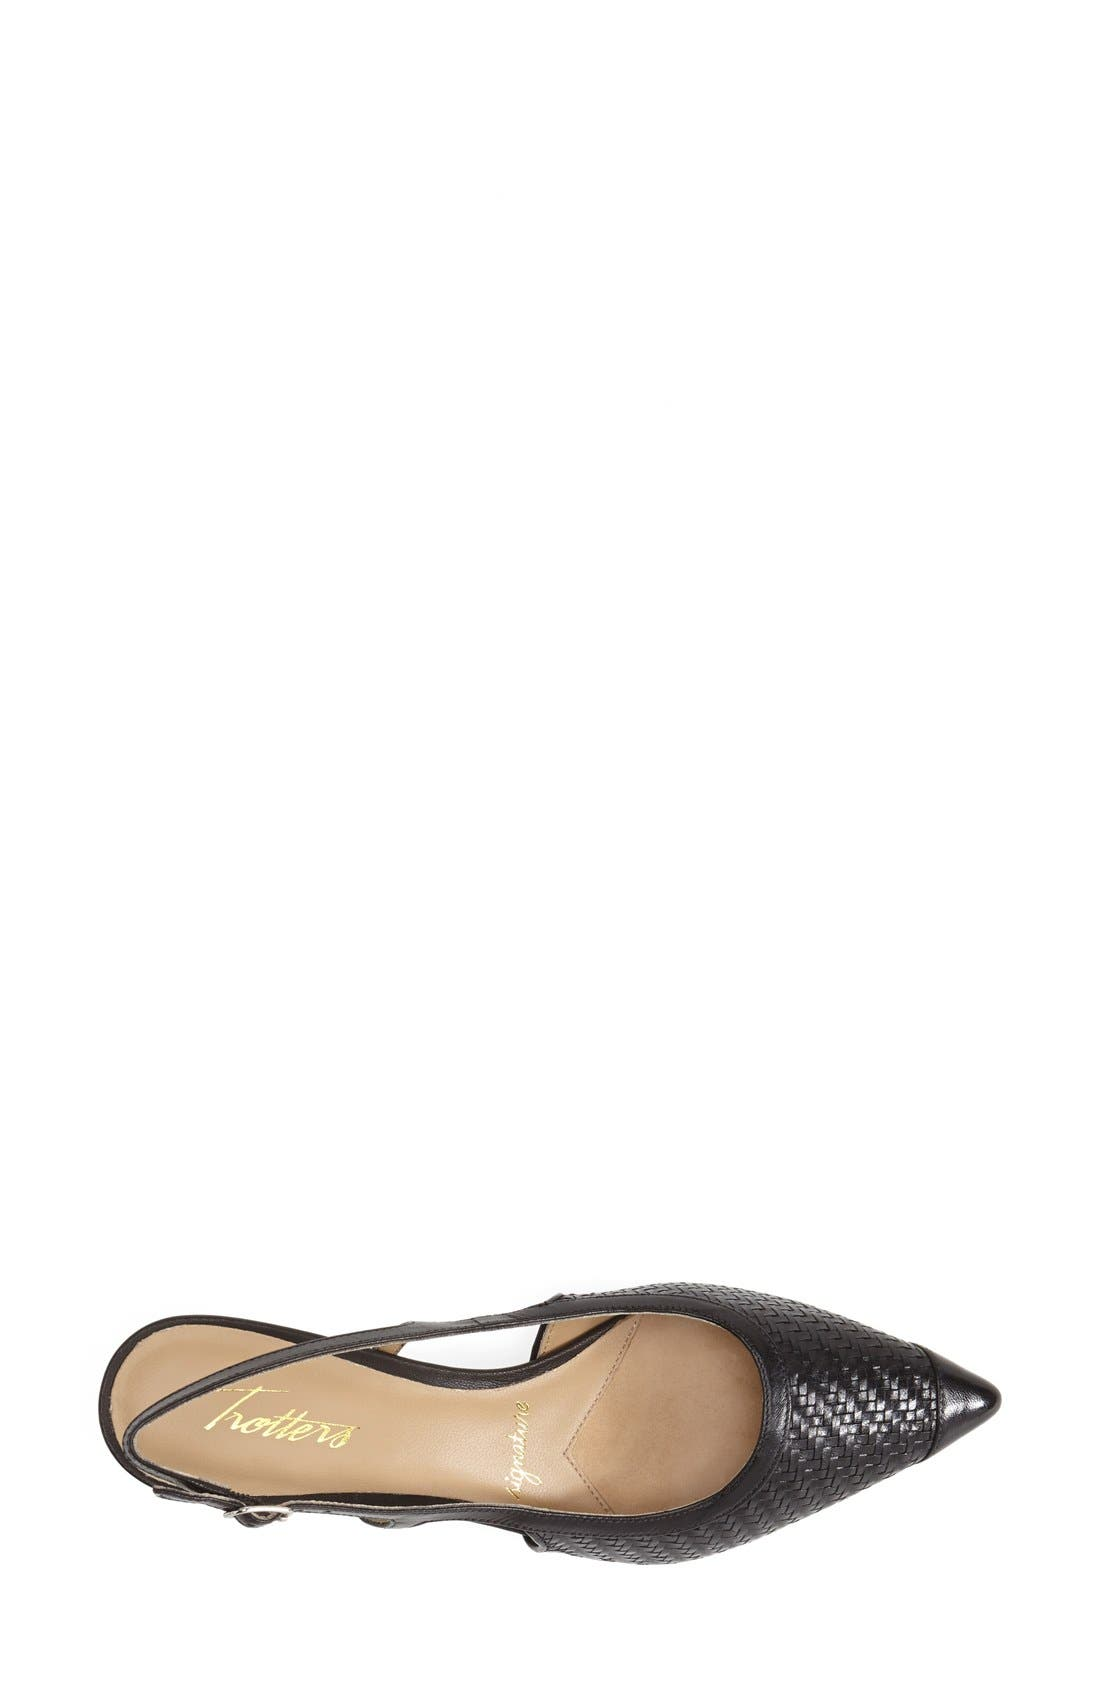 'Kimberly' Woven Leather Slingback Pump,                             Alternate thumbnail 3, color,                             BLACK